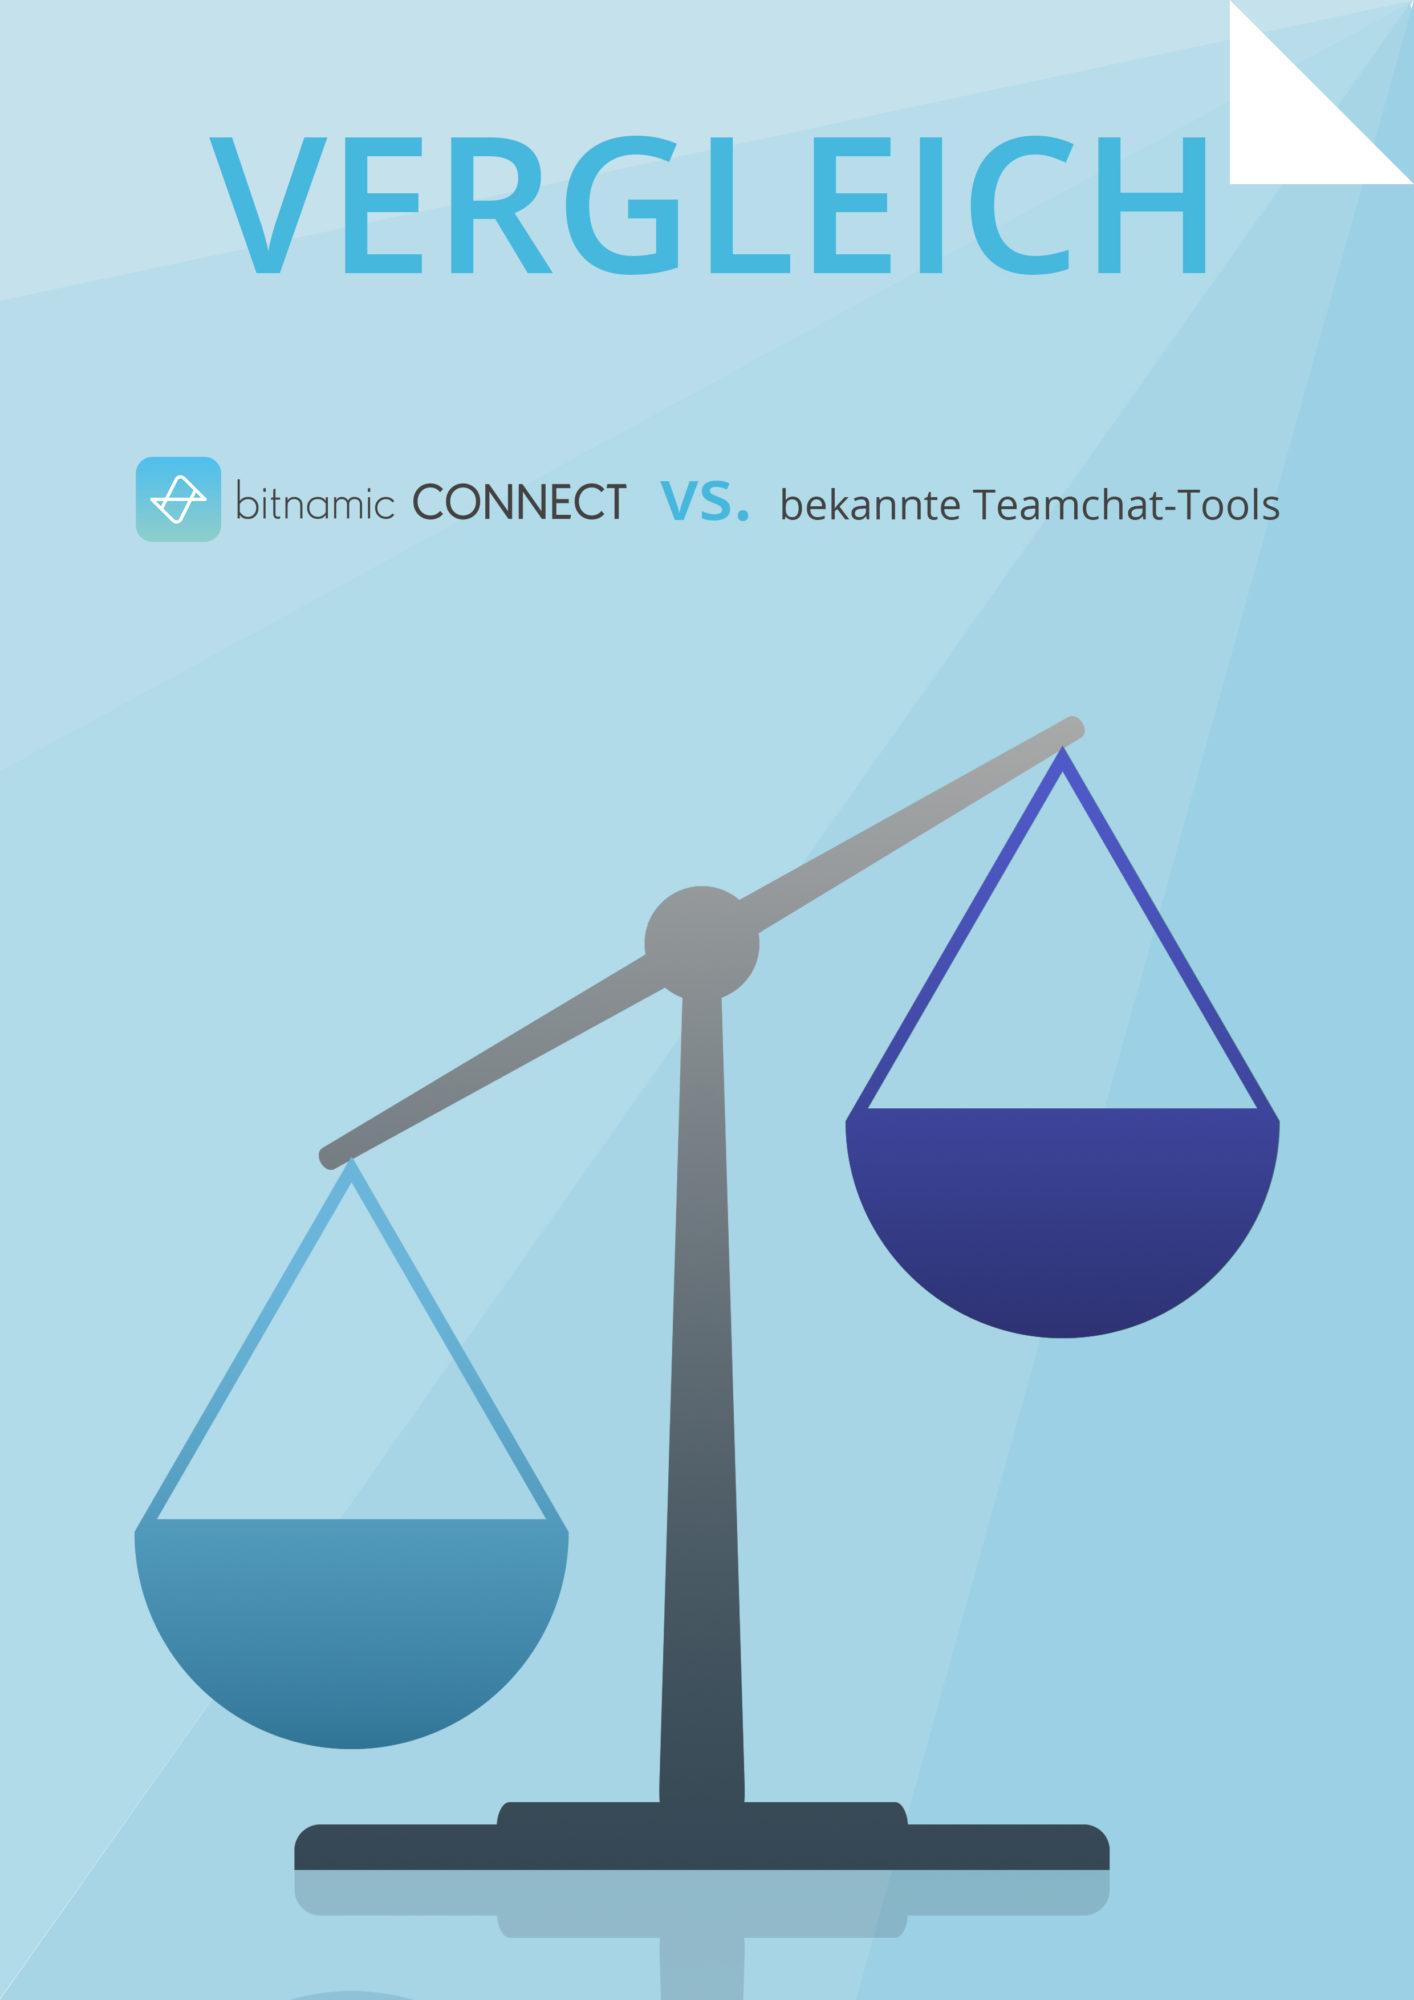 Vergleich bitnamic CONNECT vs Teamchat-Tools